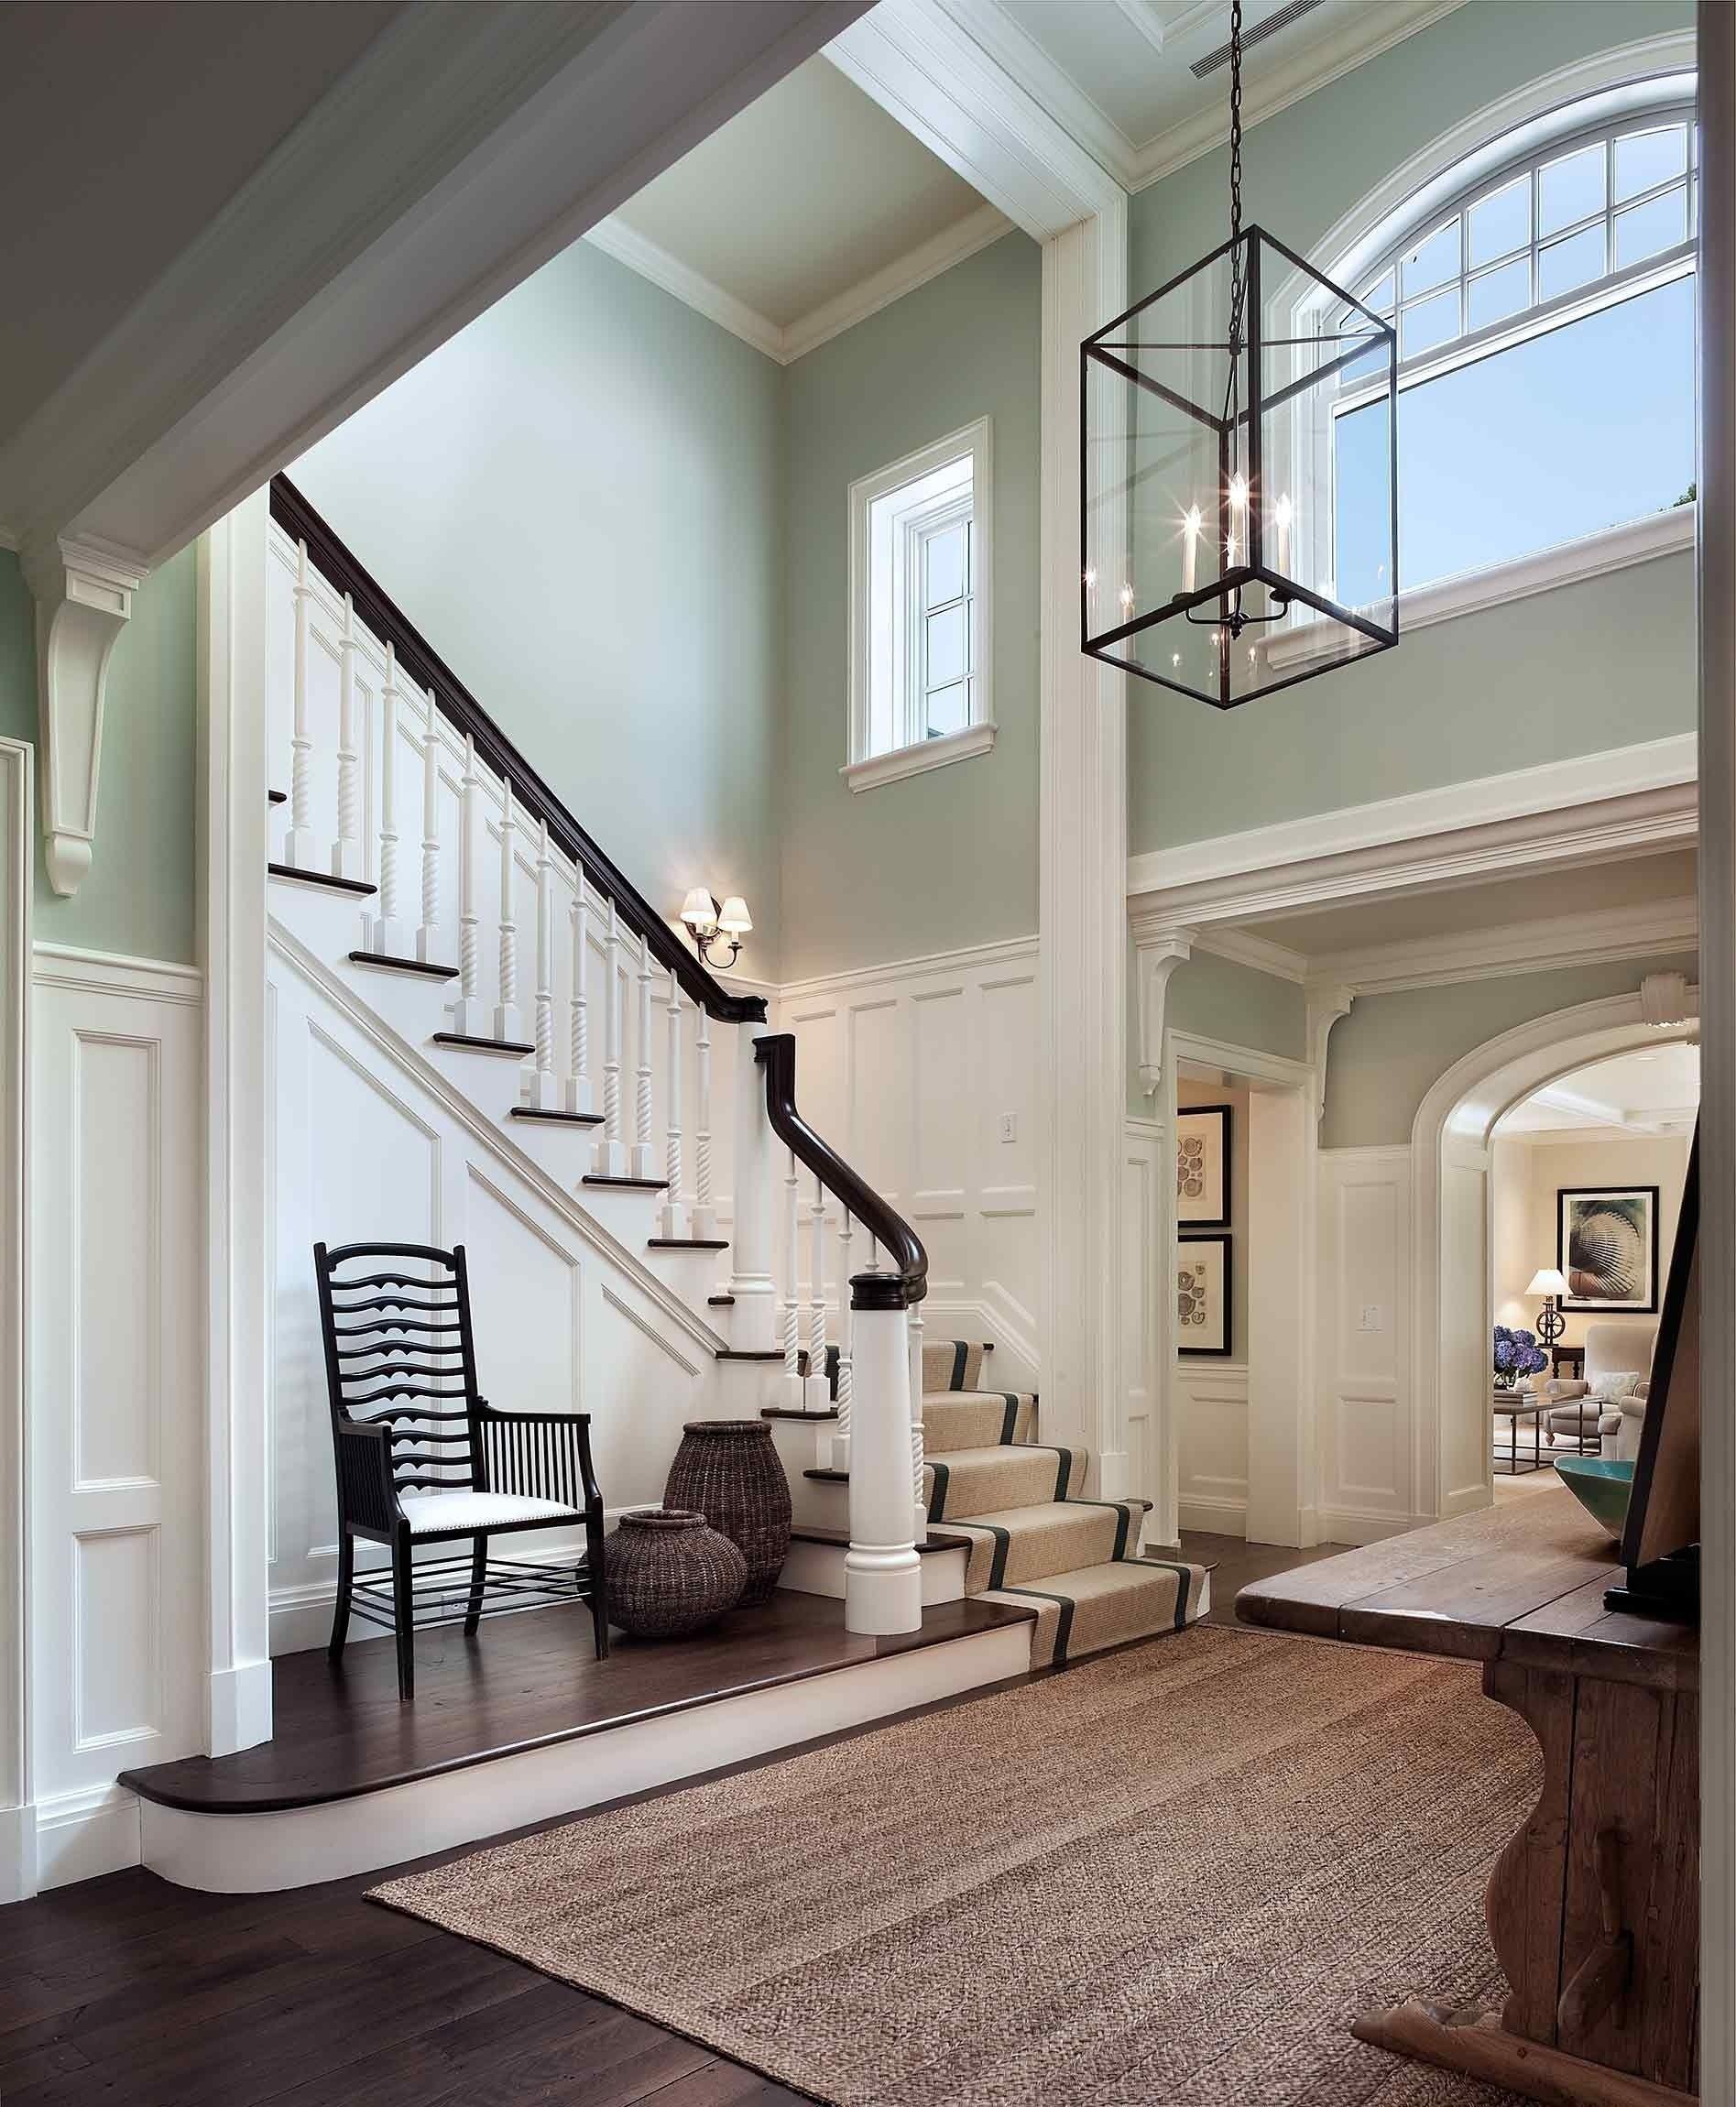 Foyer Pendant Light Fixtures Ideas On Foter